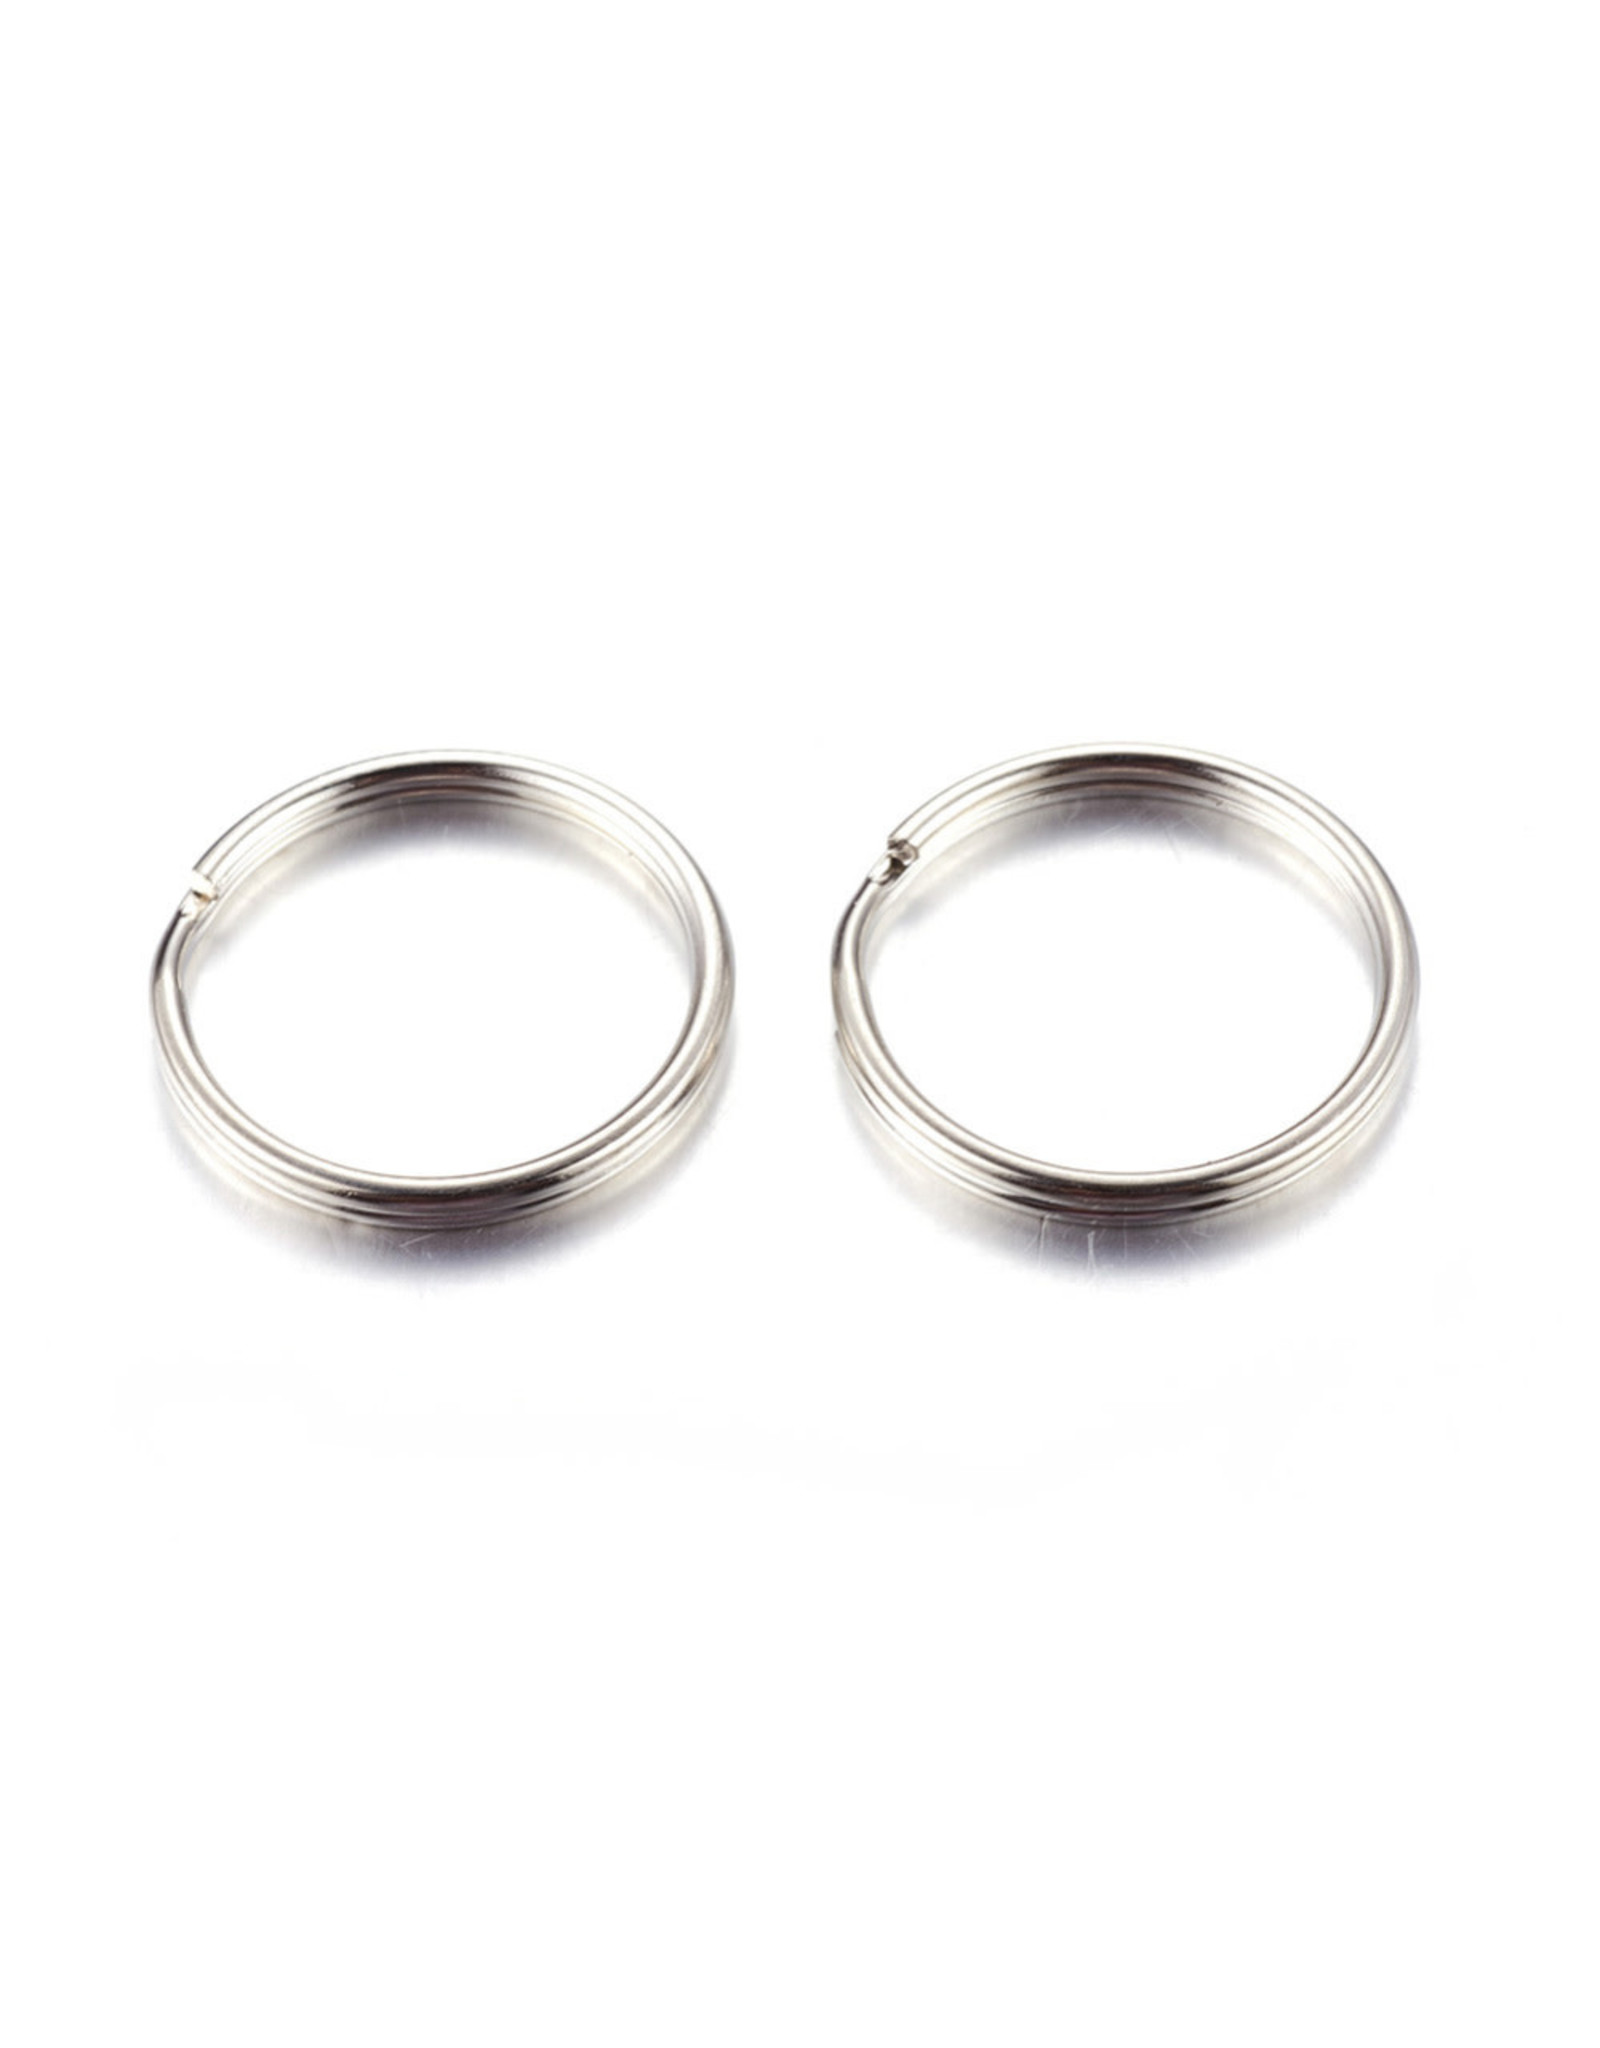 Key Ring 20mm Nickel Colour x100